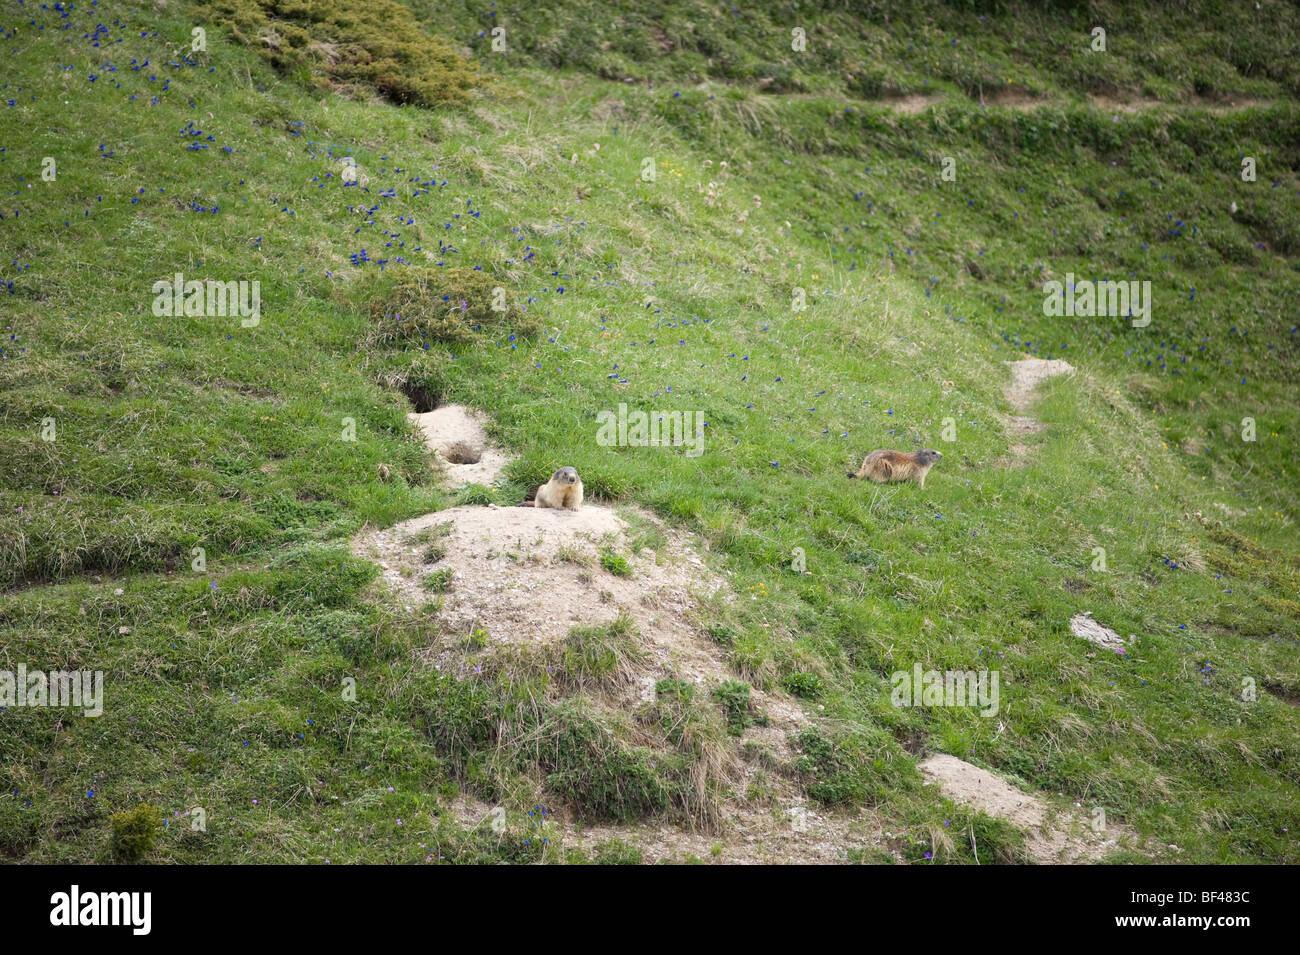 Marmot burrow on an alpine hillside with gentians - Stock Image